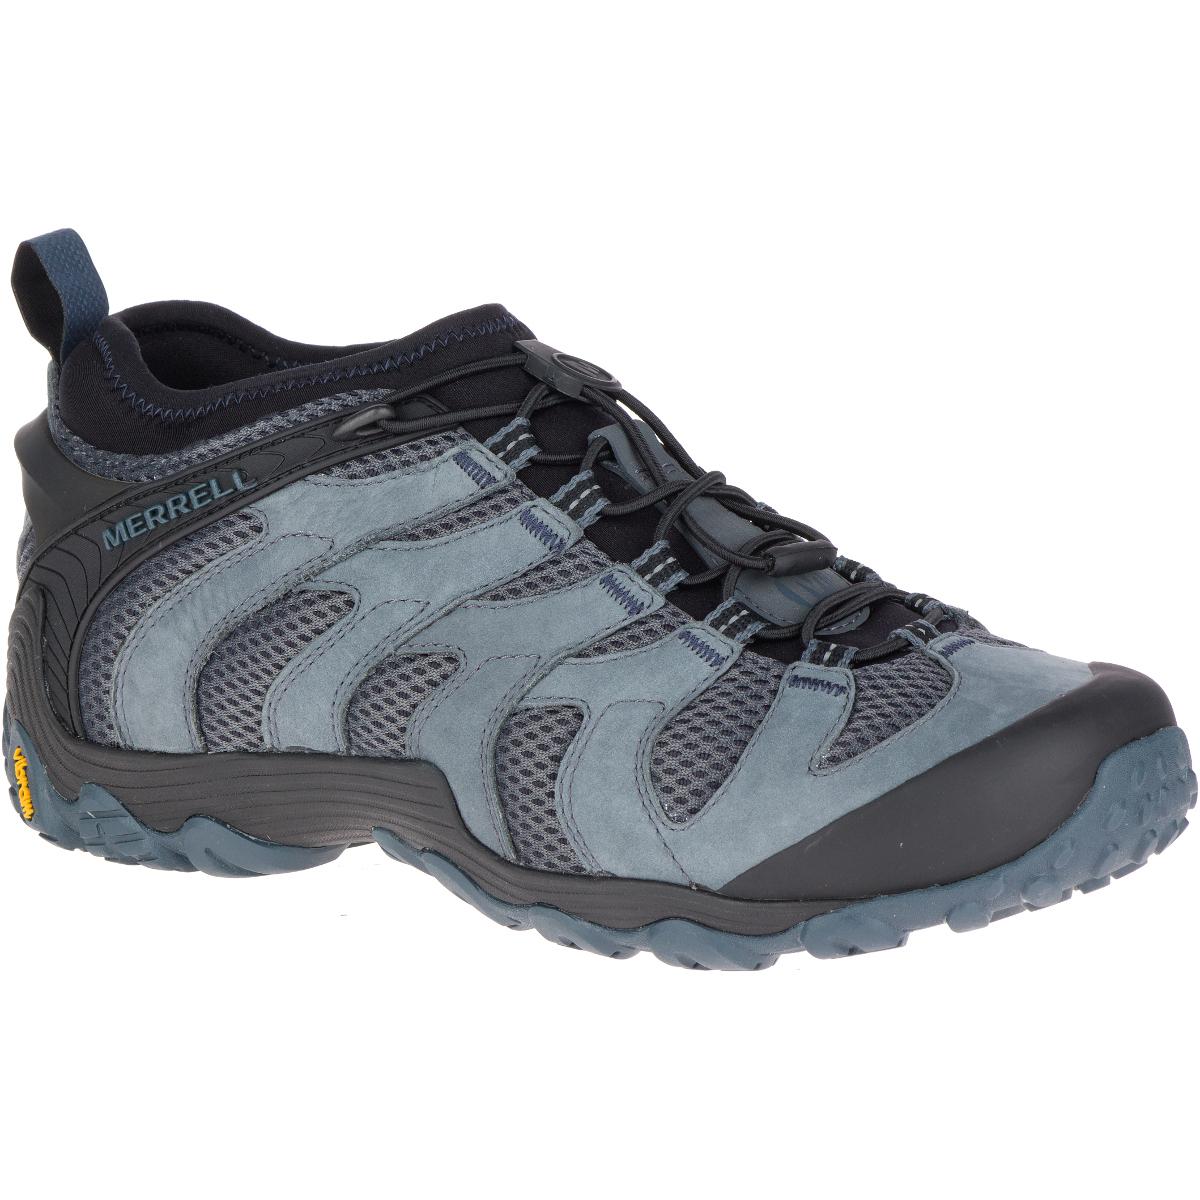 Merrell Men's Chameleon 7 Stretch Low Hiking Shoes - Black, 7.5